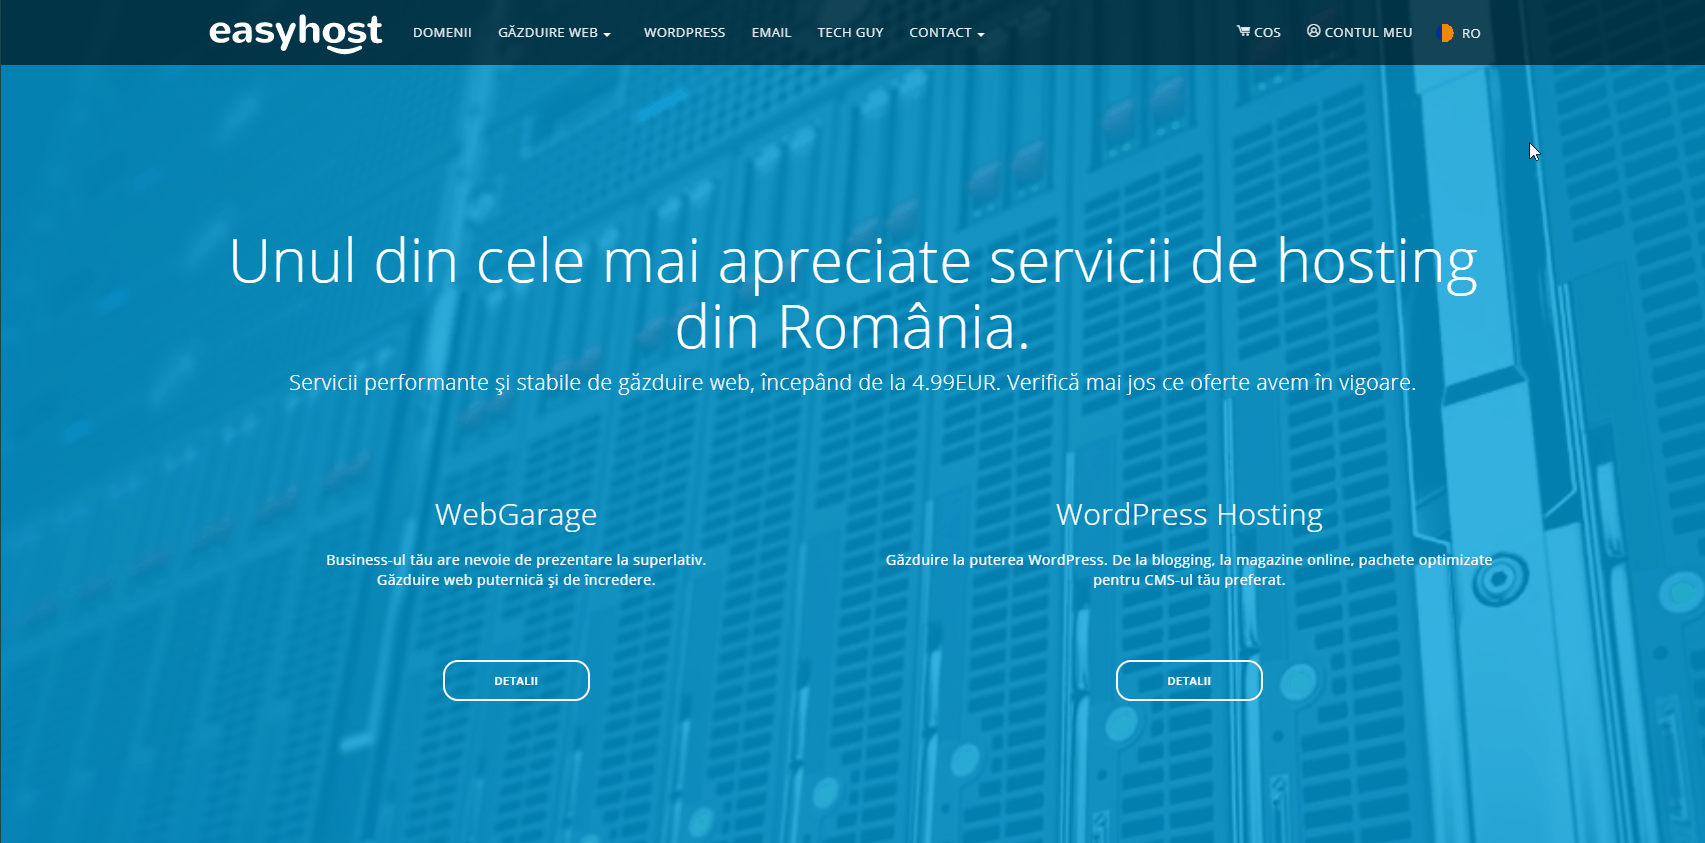 Recenzie găzduire web Easyhost